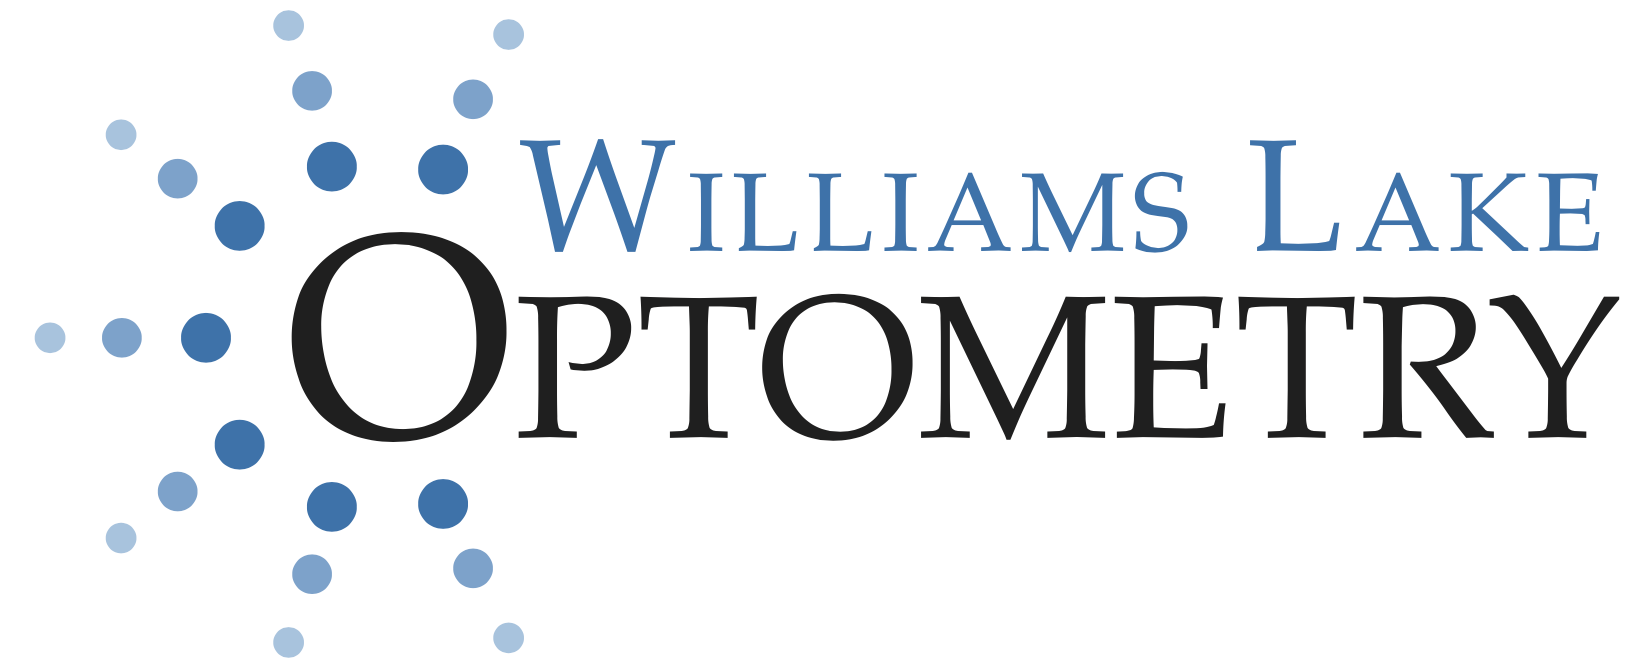 Williams Lake Optometry